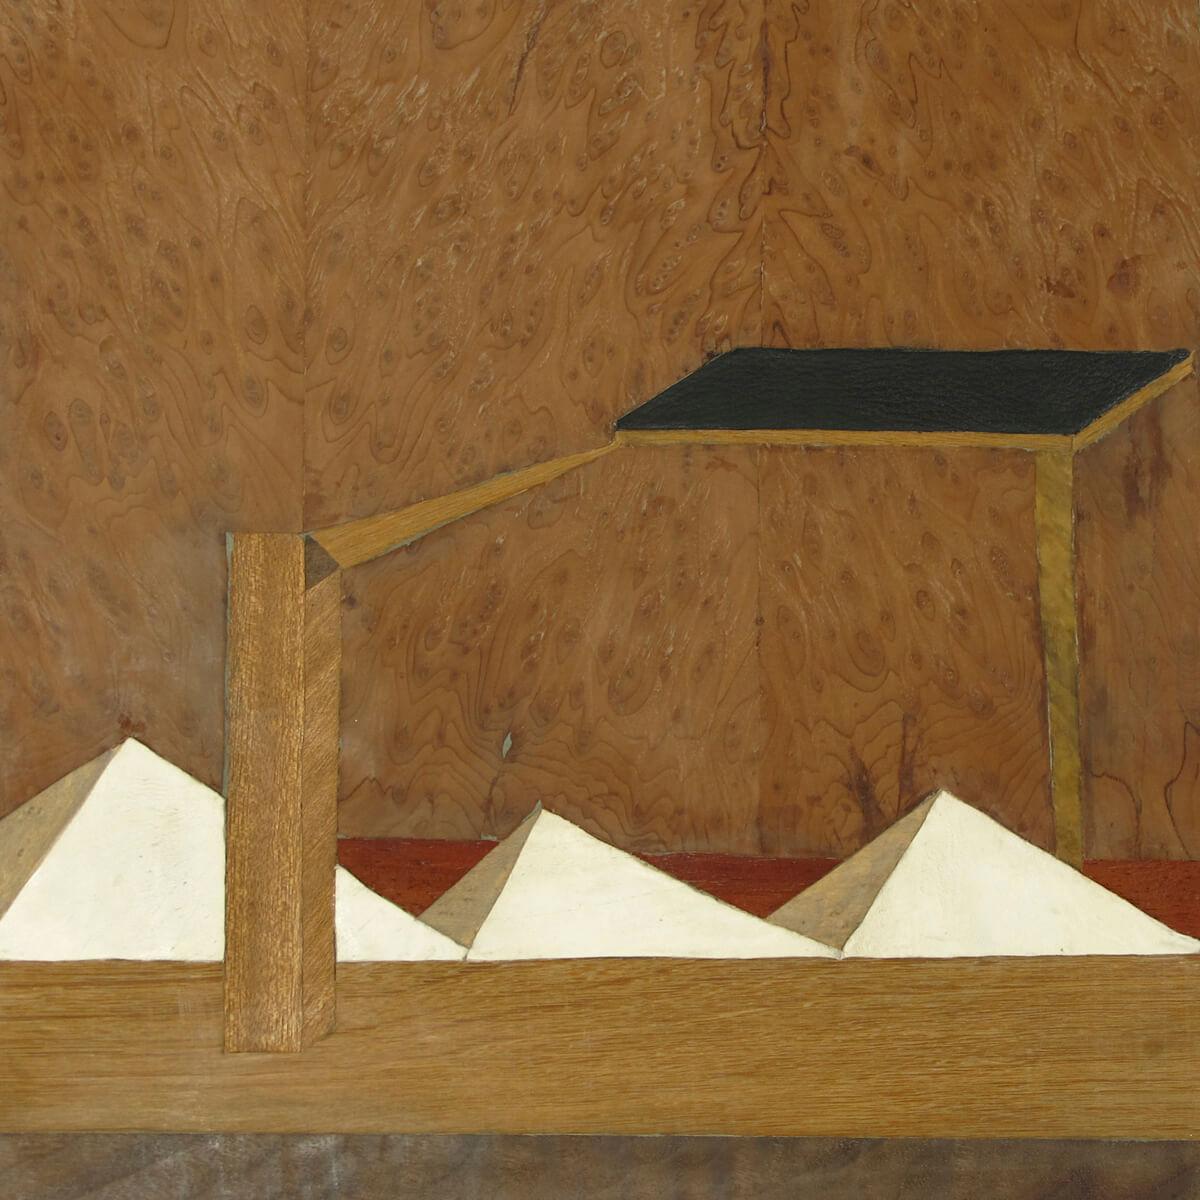 Christina Beifuss, Ohio I, Holzfurnier, Intarsie, 2010